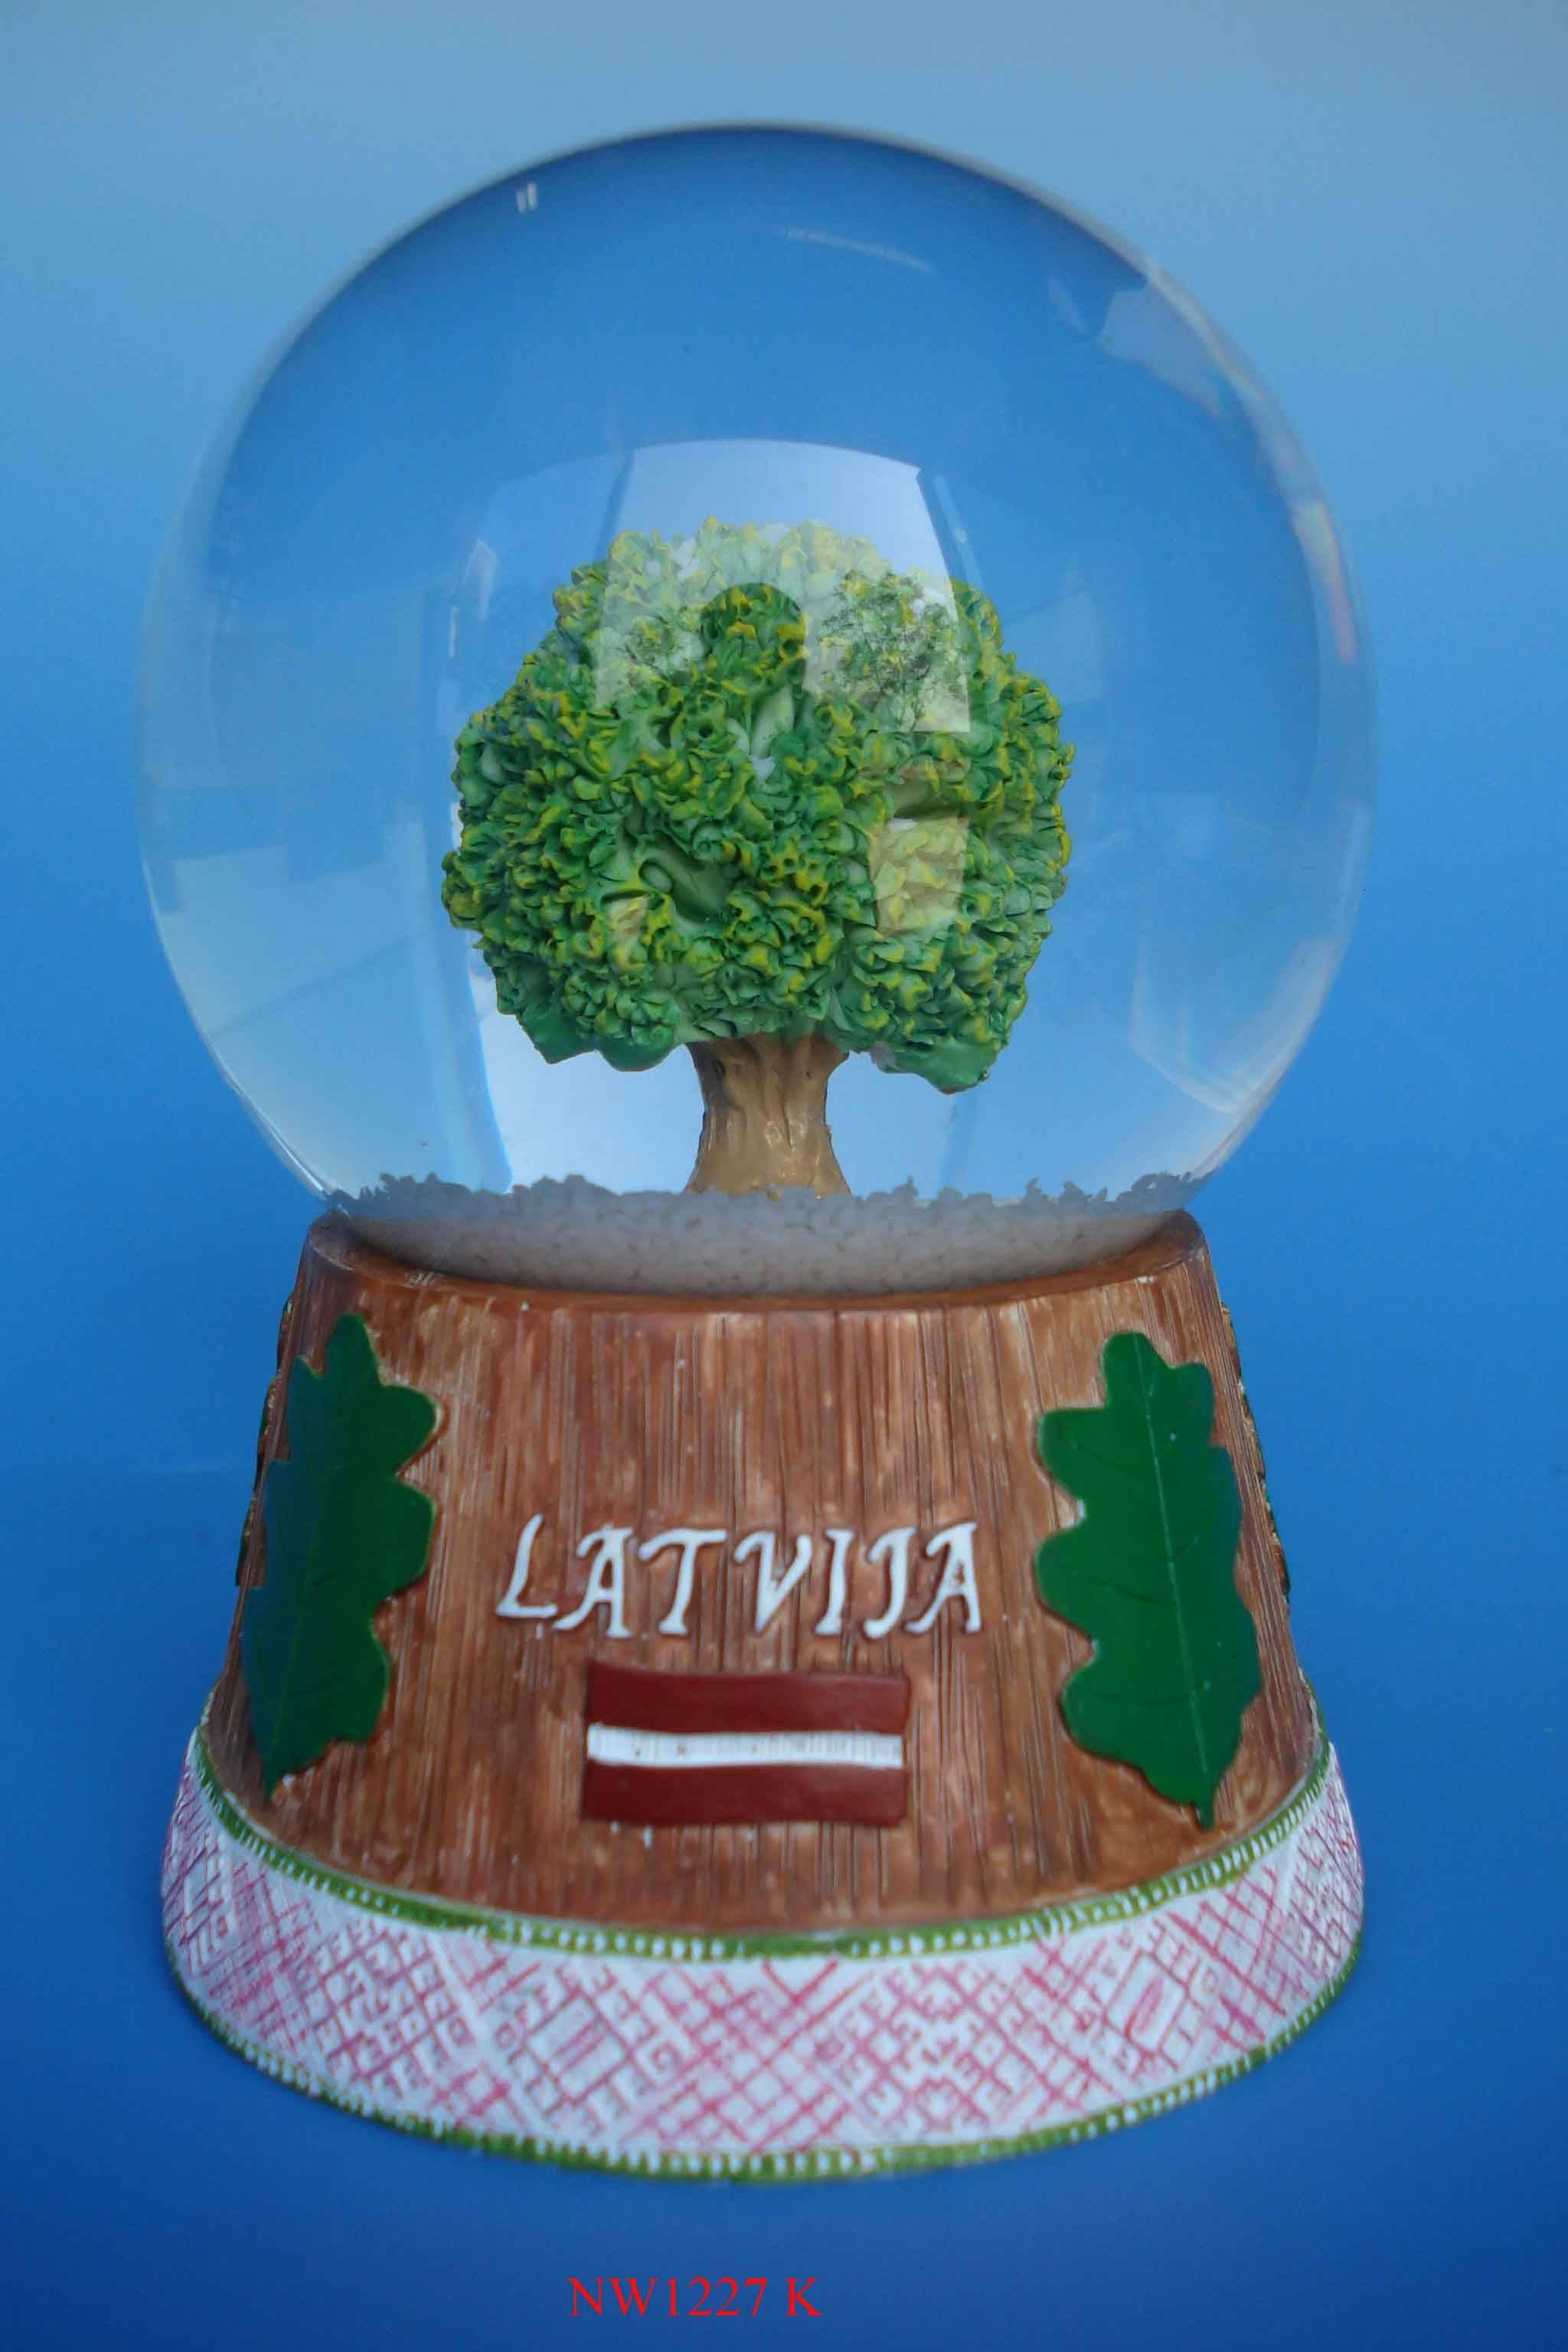 snow dome,snowball,souvenir, water globe